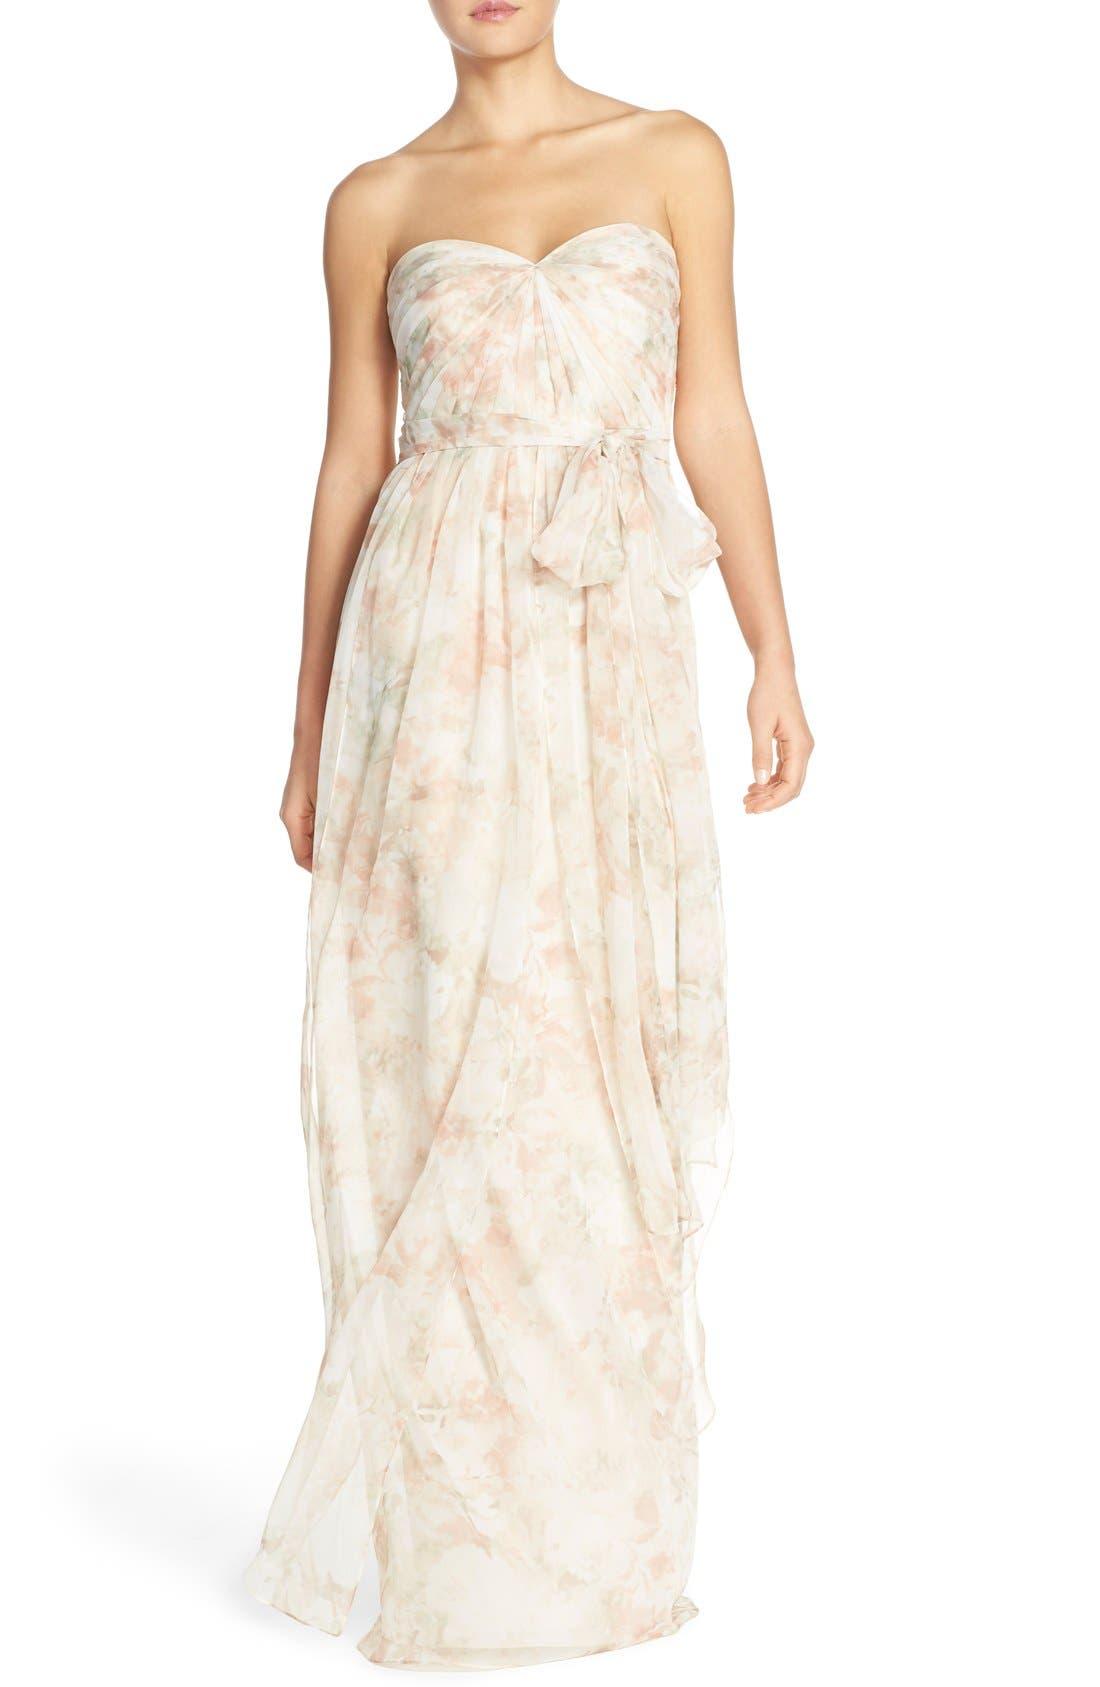 Nyla Floral Print Convertible Strapless Chiffon Gown,                             Main thumbnail 1, color,                             Blush Multi